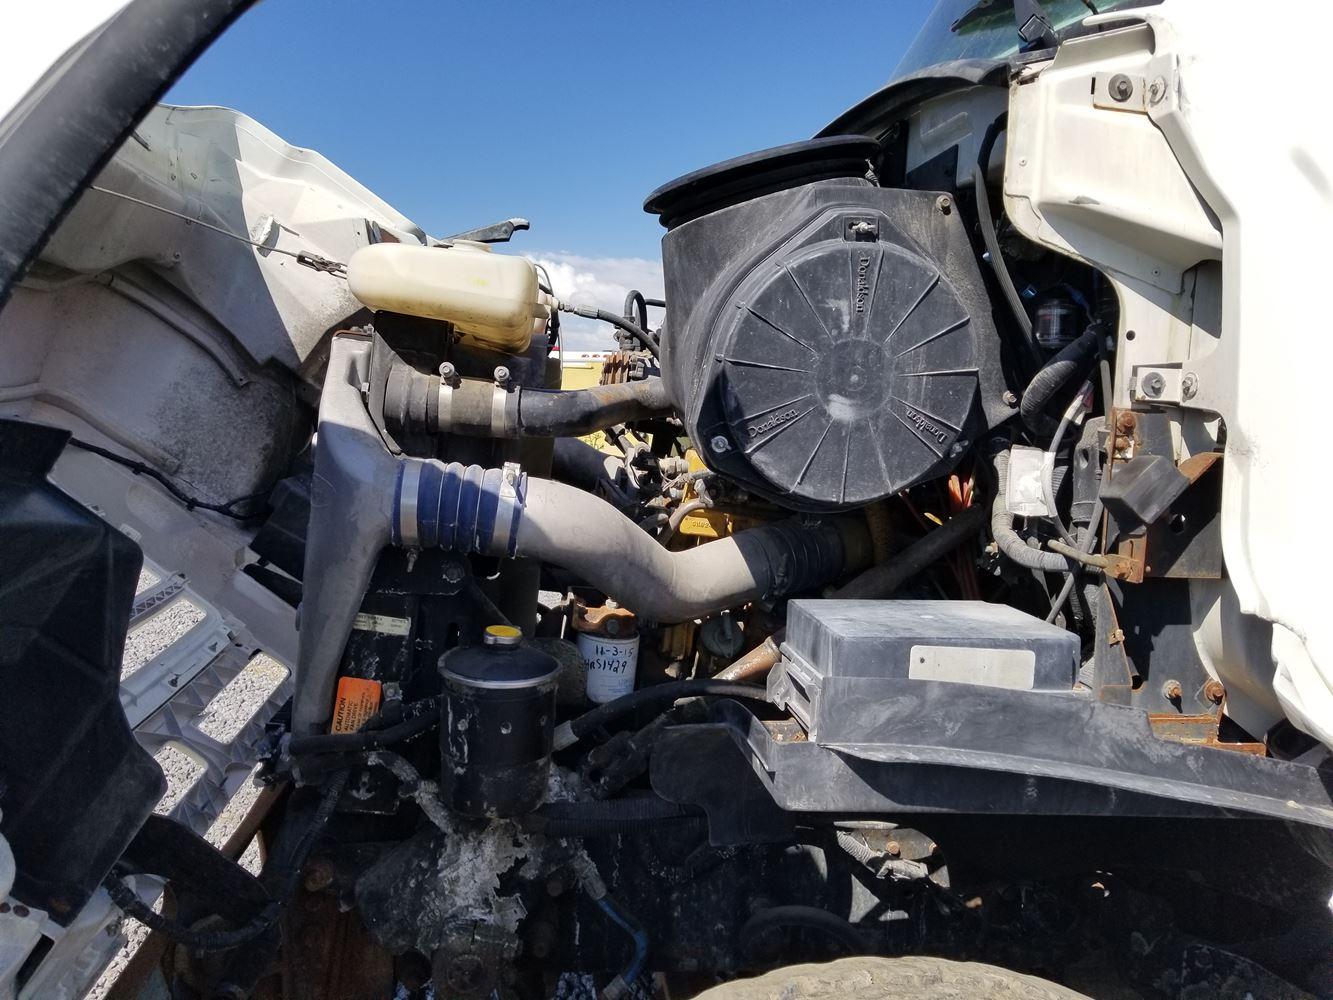 Engines Engine Parts Holst Truck Cat 3306 Wiring Harness 62518 13 Assys Make Caterpillar Model